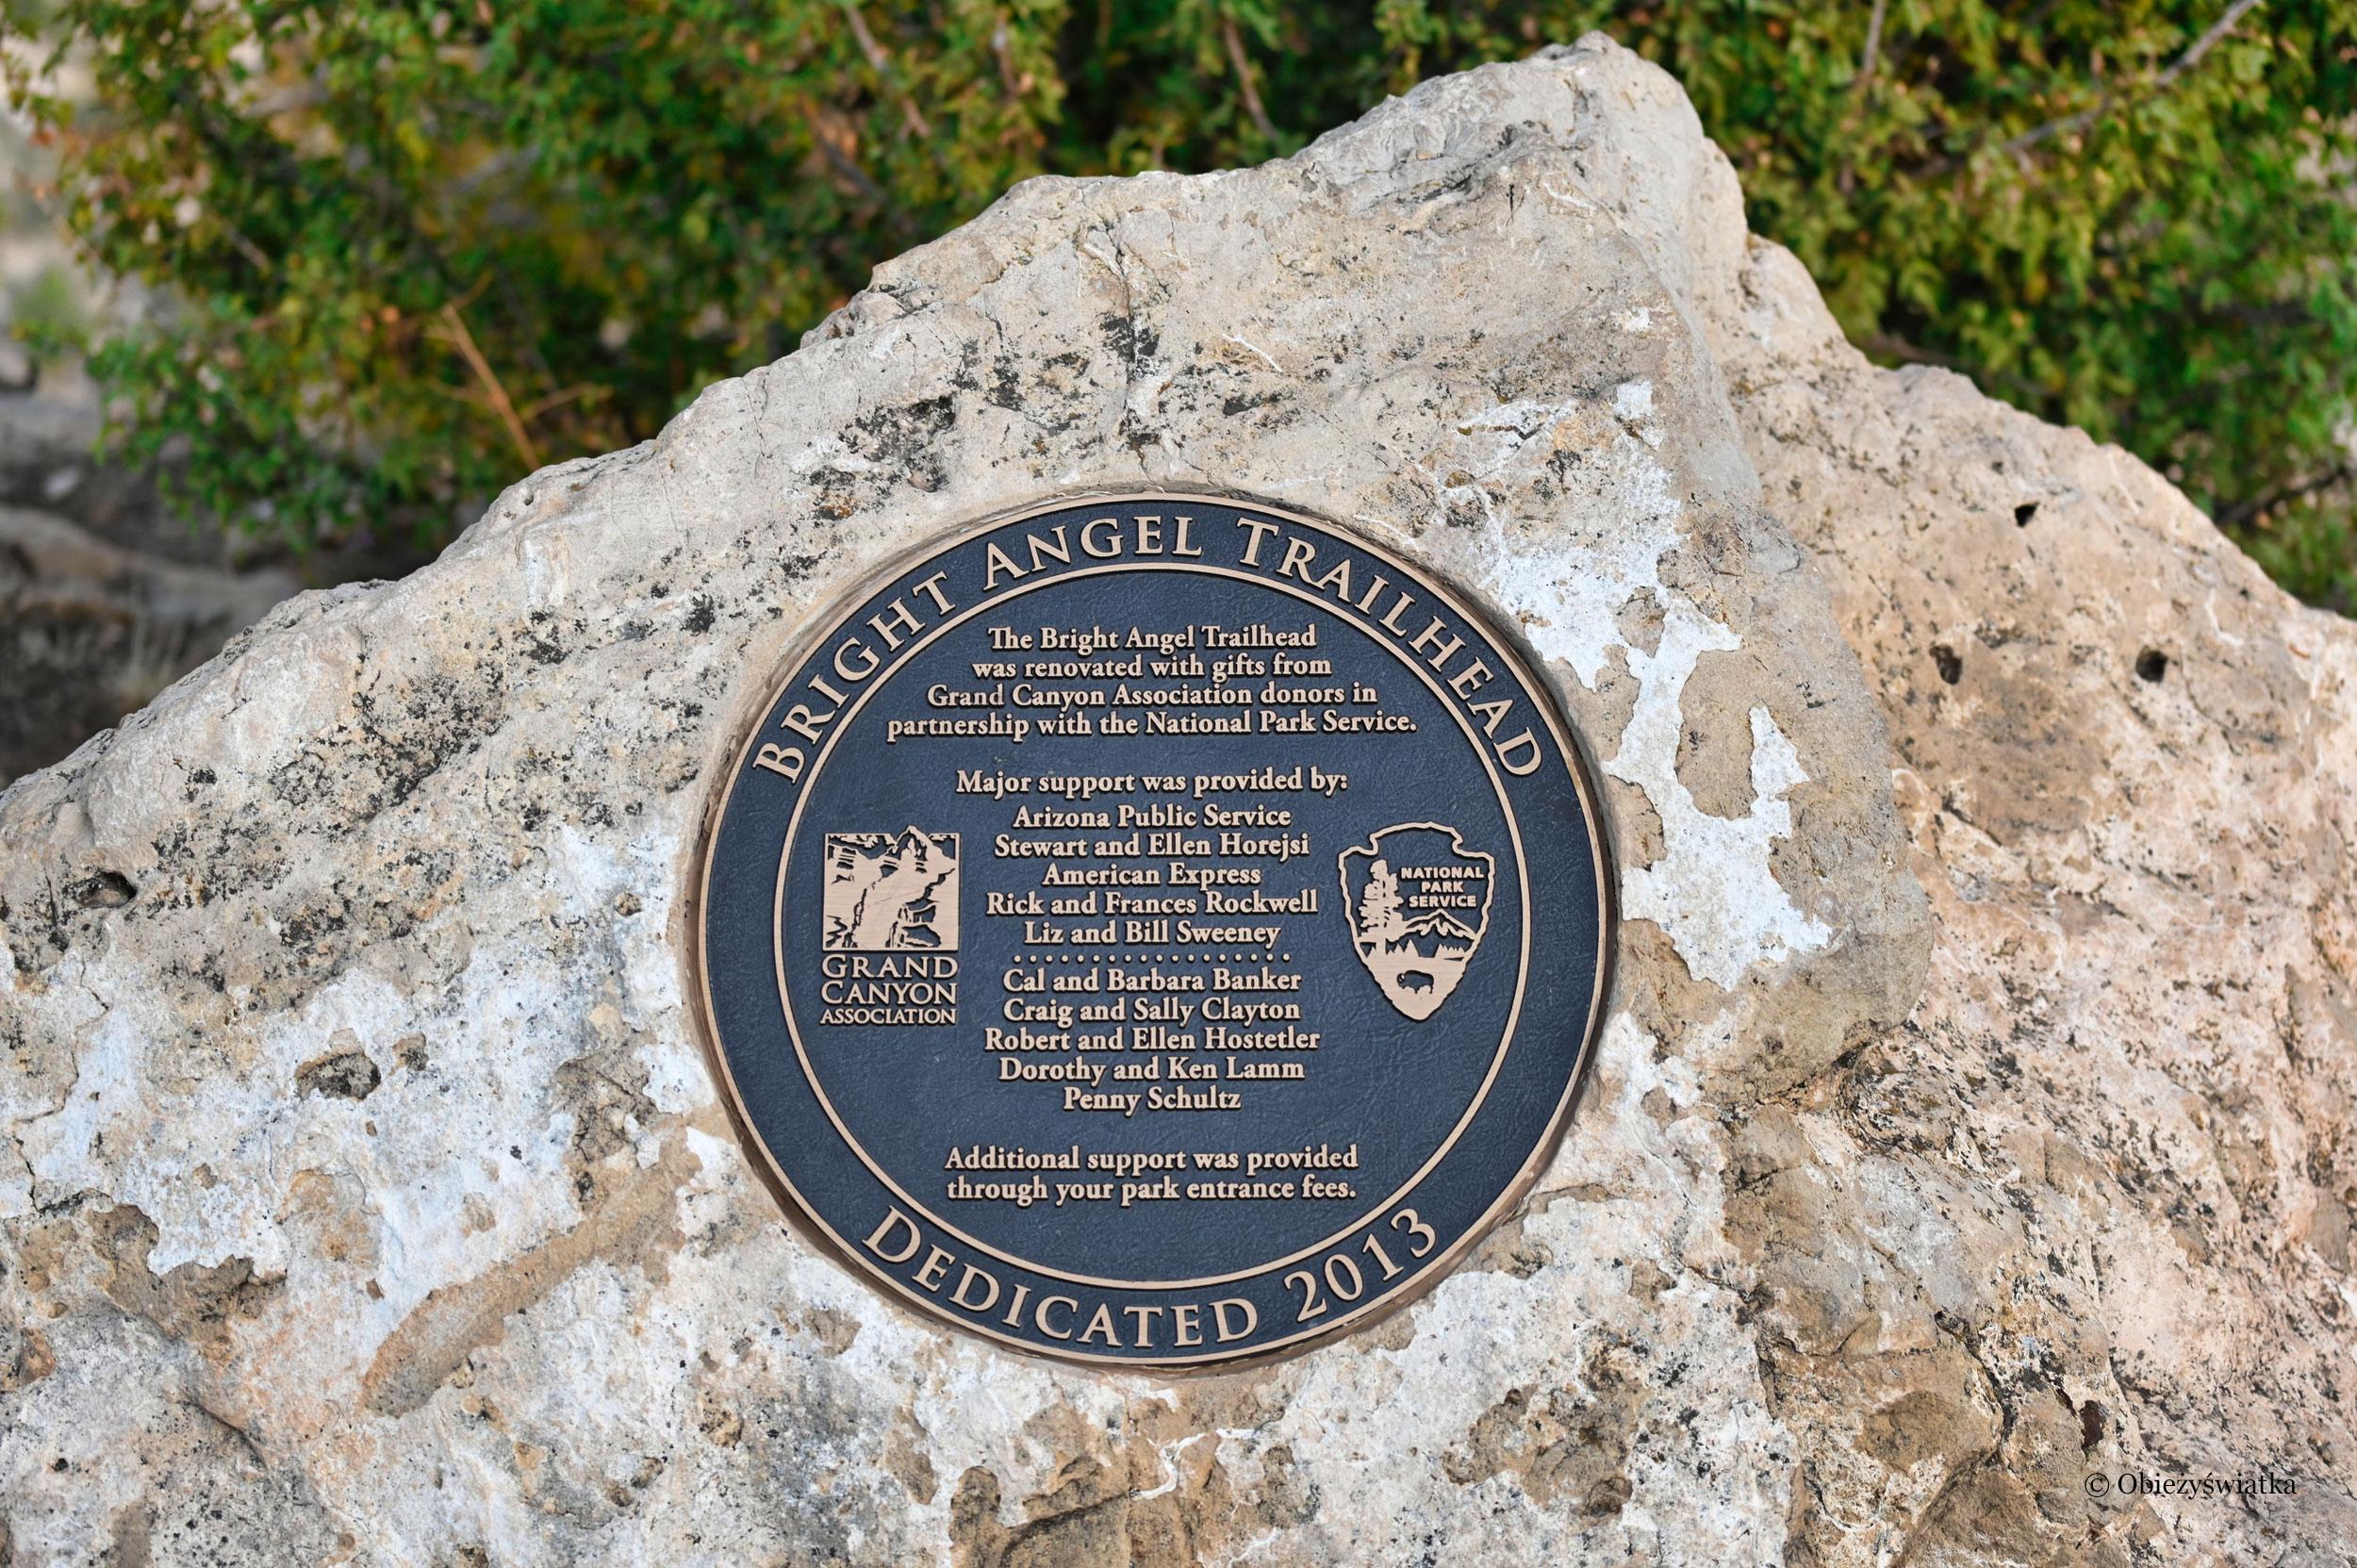 Pamiątkowa tablica - Bright Angel Trail, Grand Canyon